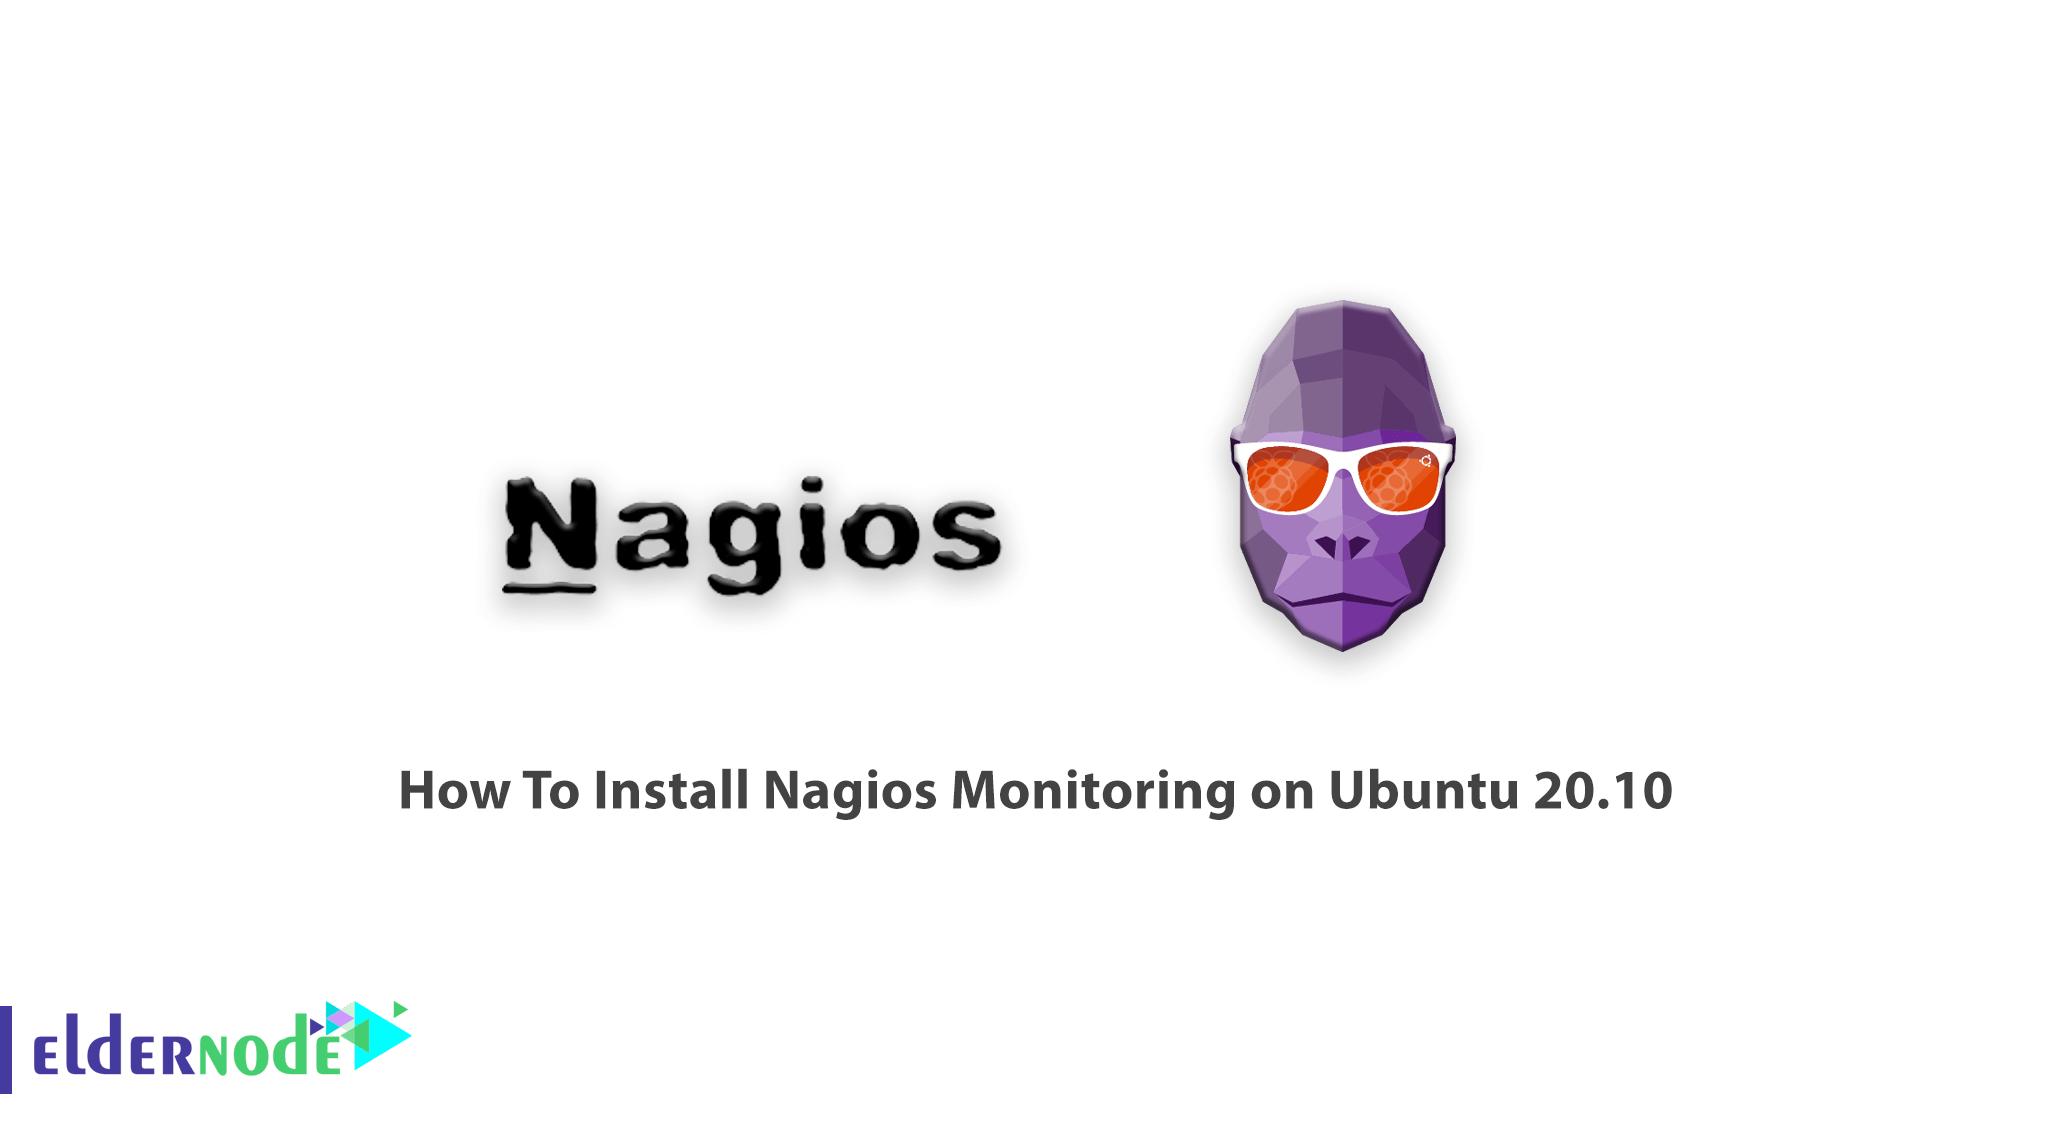 How To Install Nagios Monitoring on Ubuntu 20.10